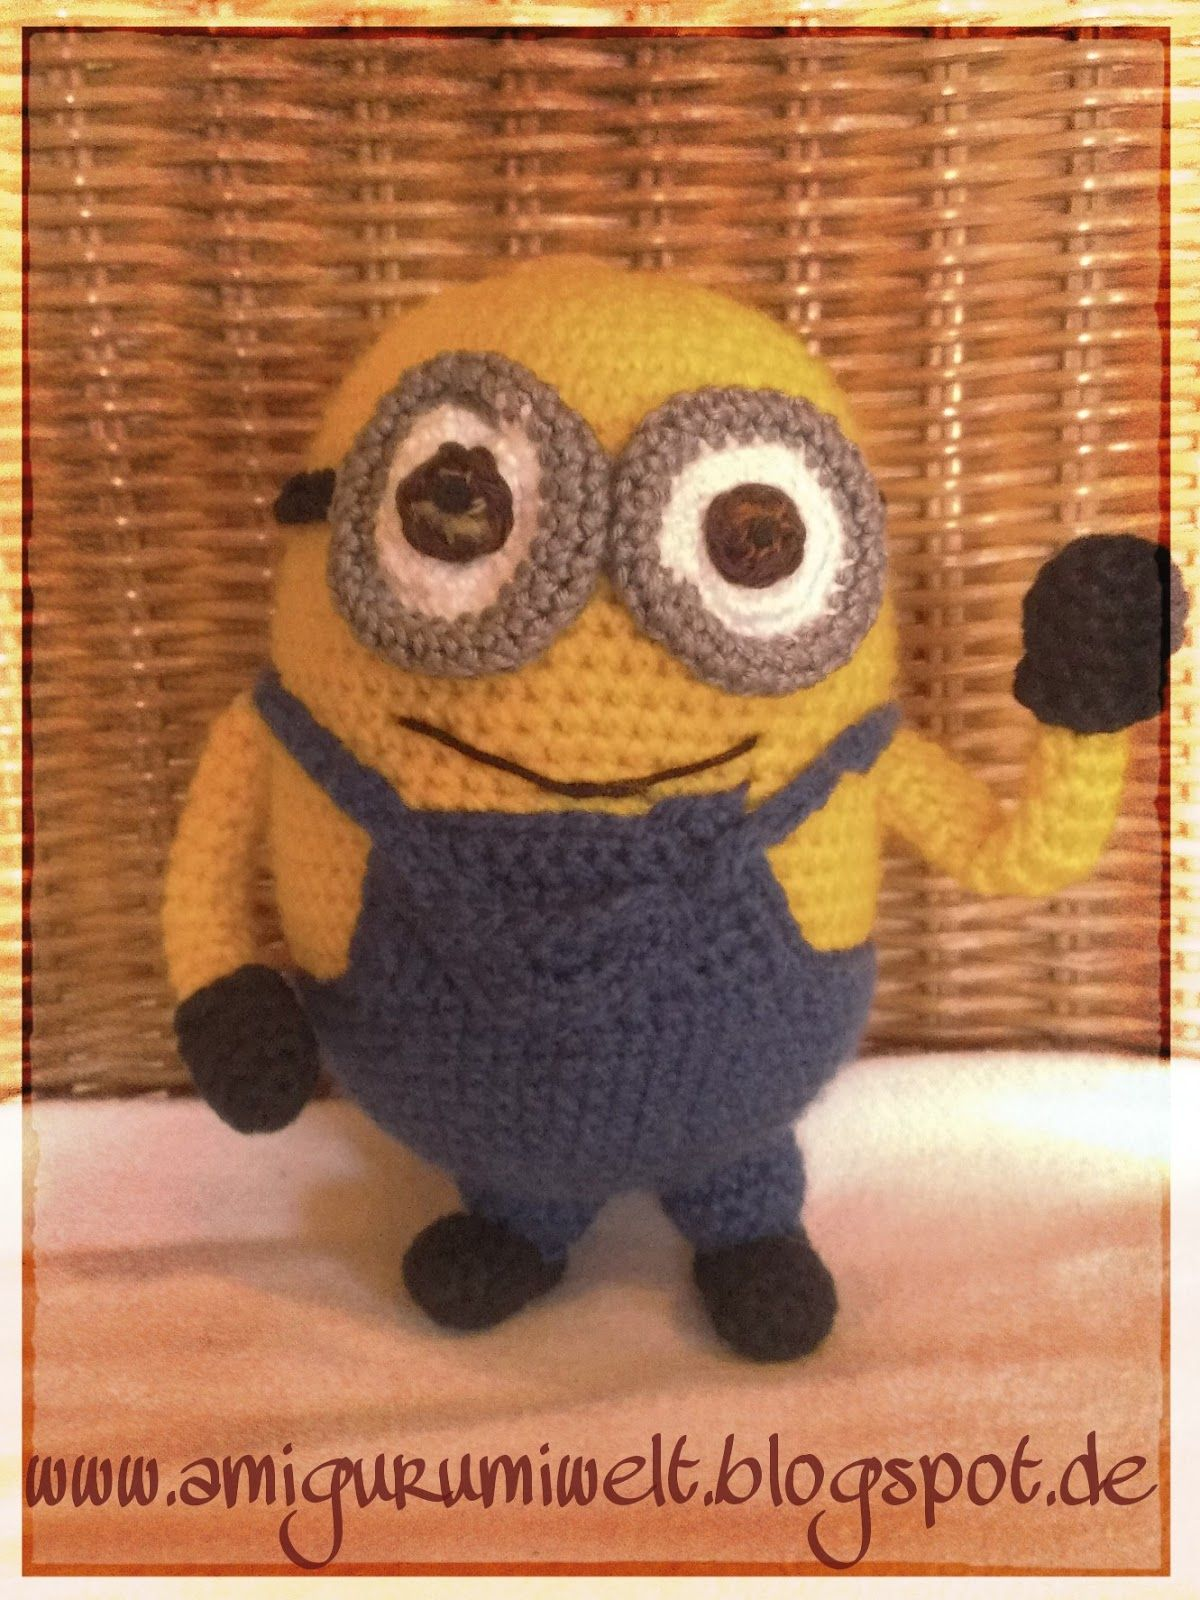 amigurumi häkeln crochet minions kostenlos übersetzung ...